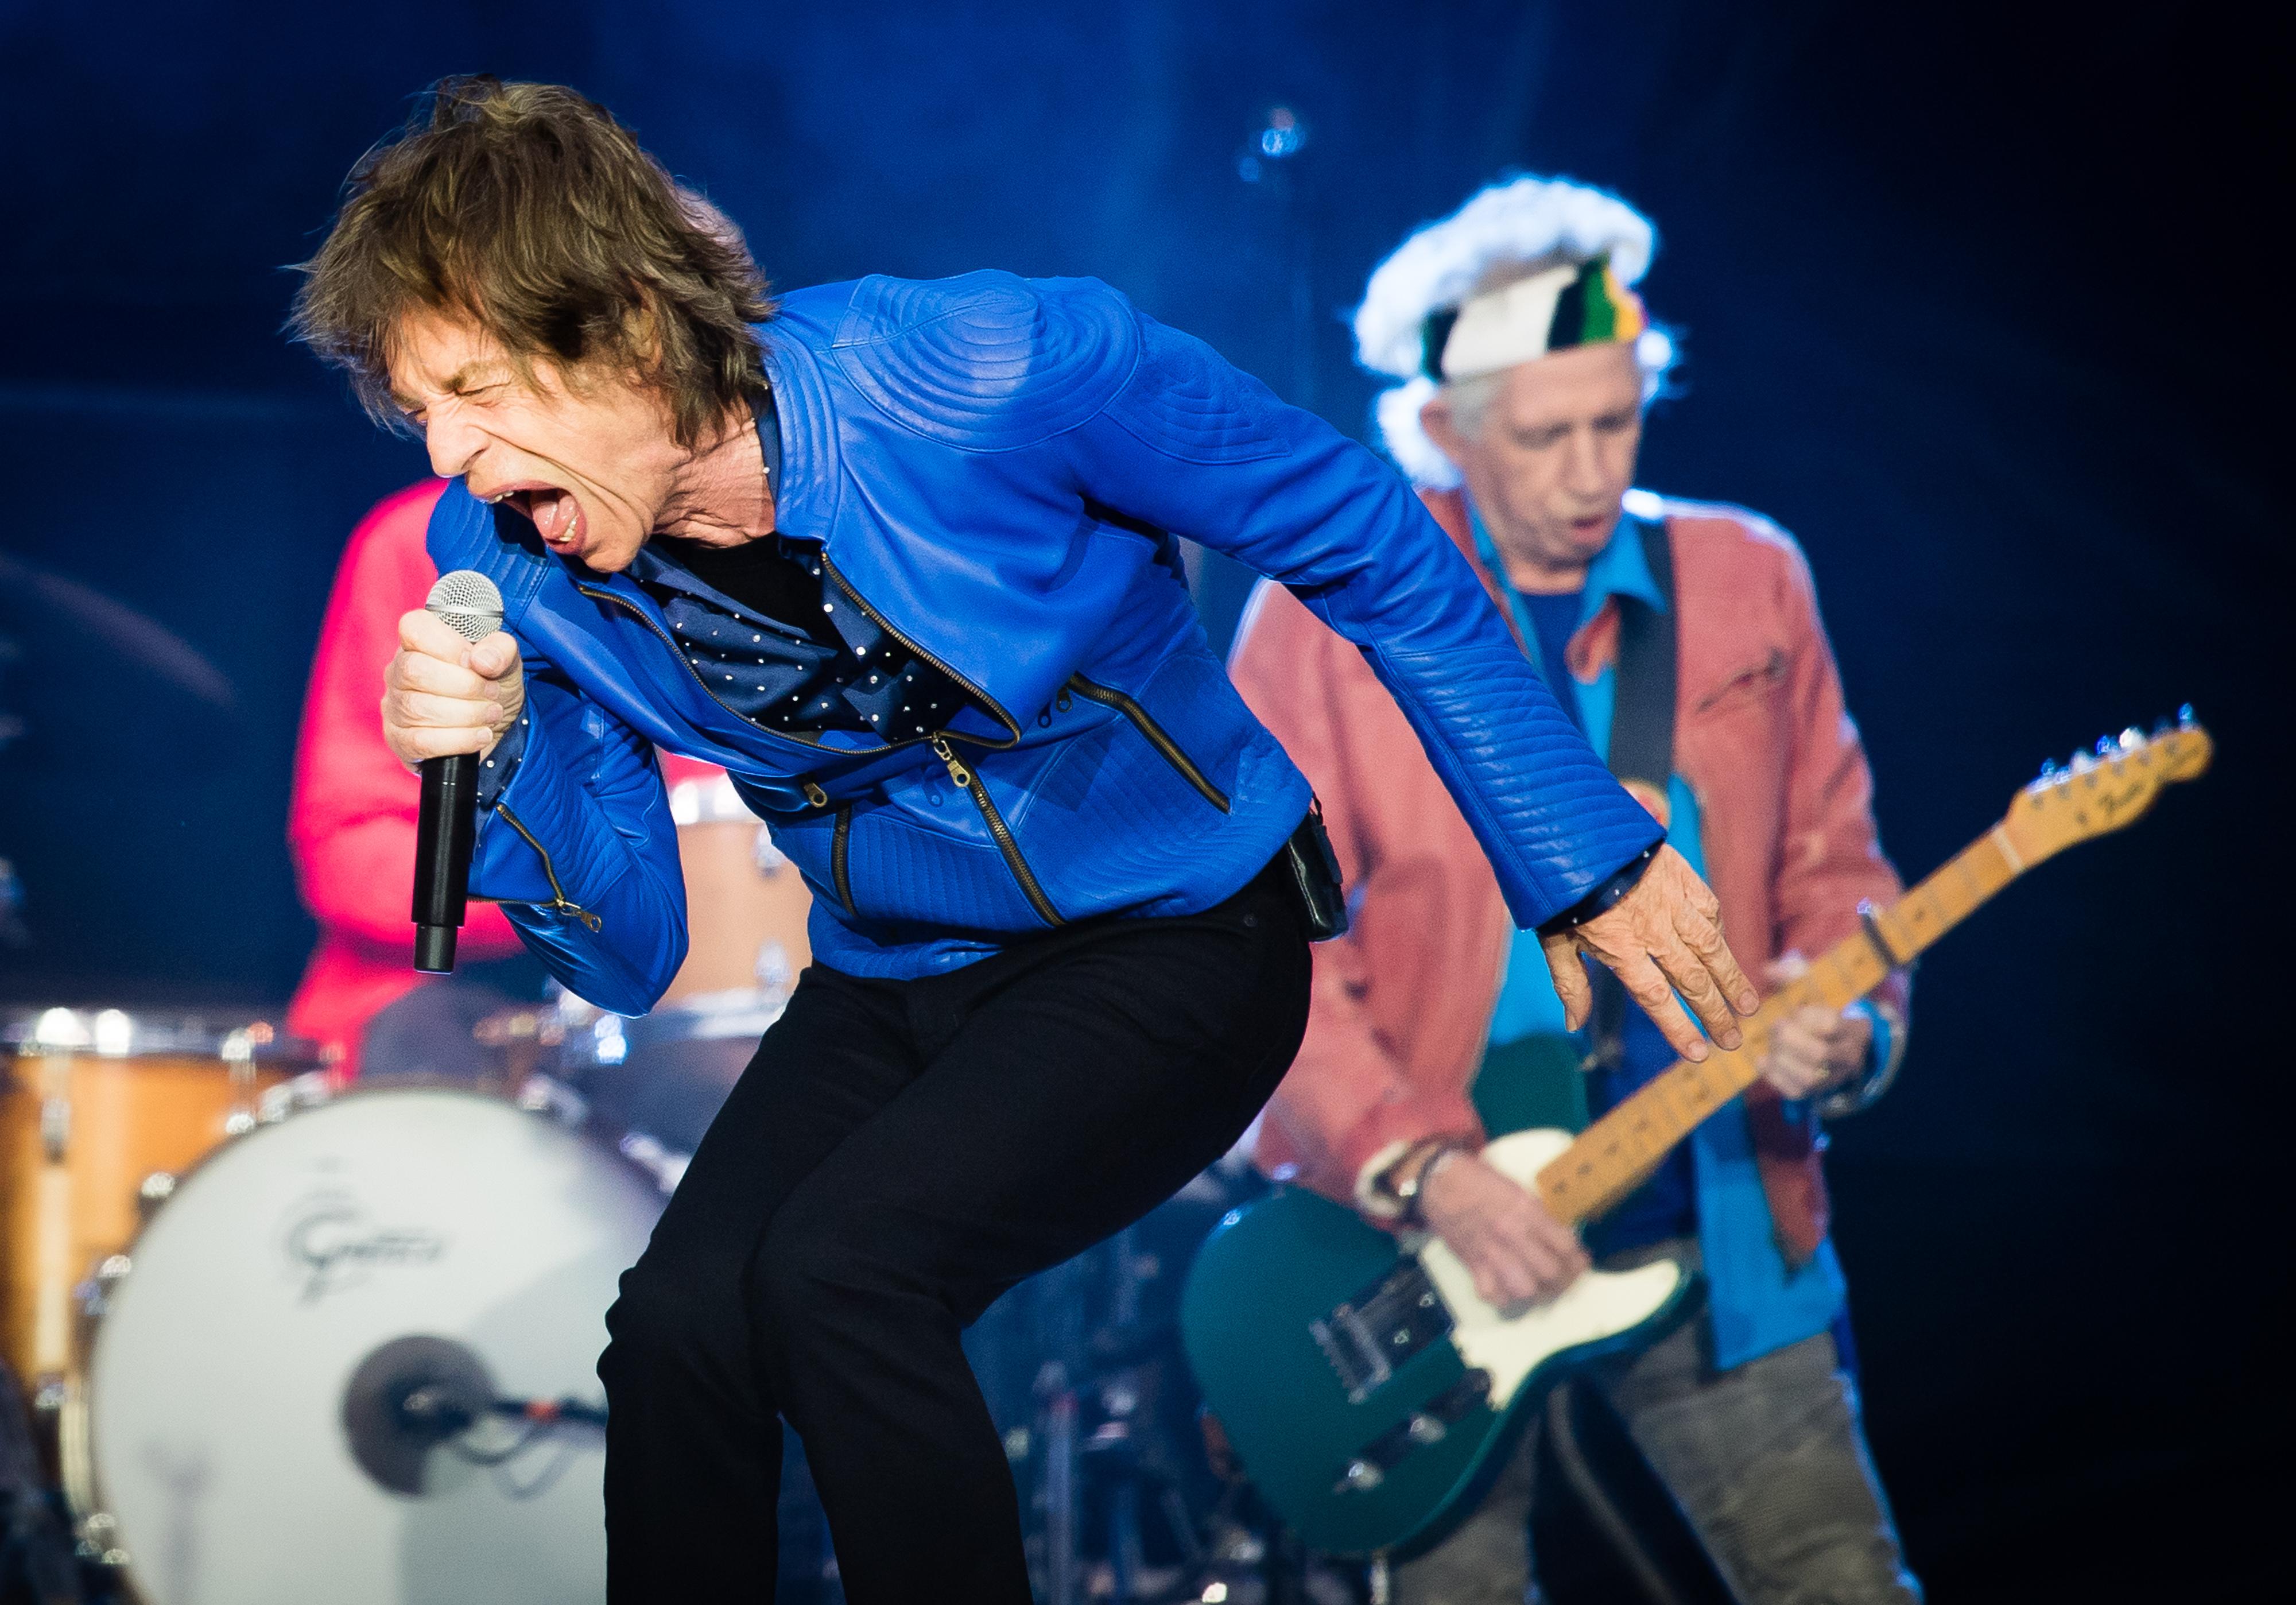 Mick Jagger und Keith Richards von den Rolling Stones live in Cardiff (Wales)